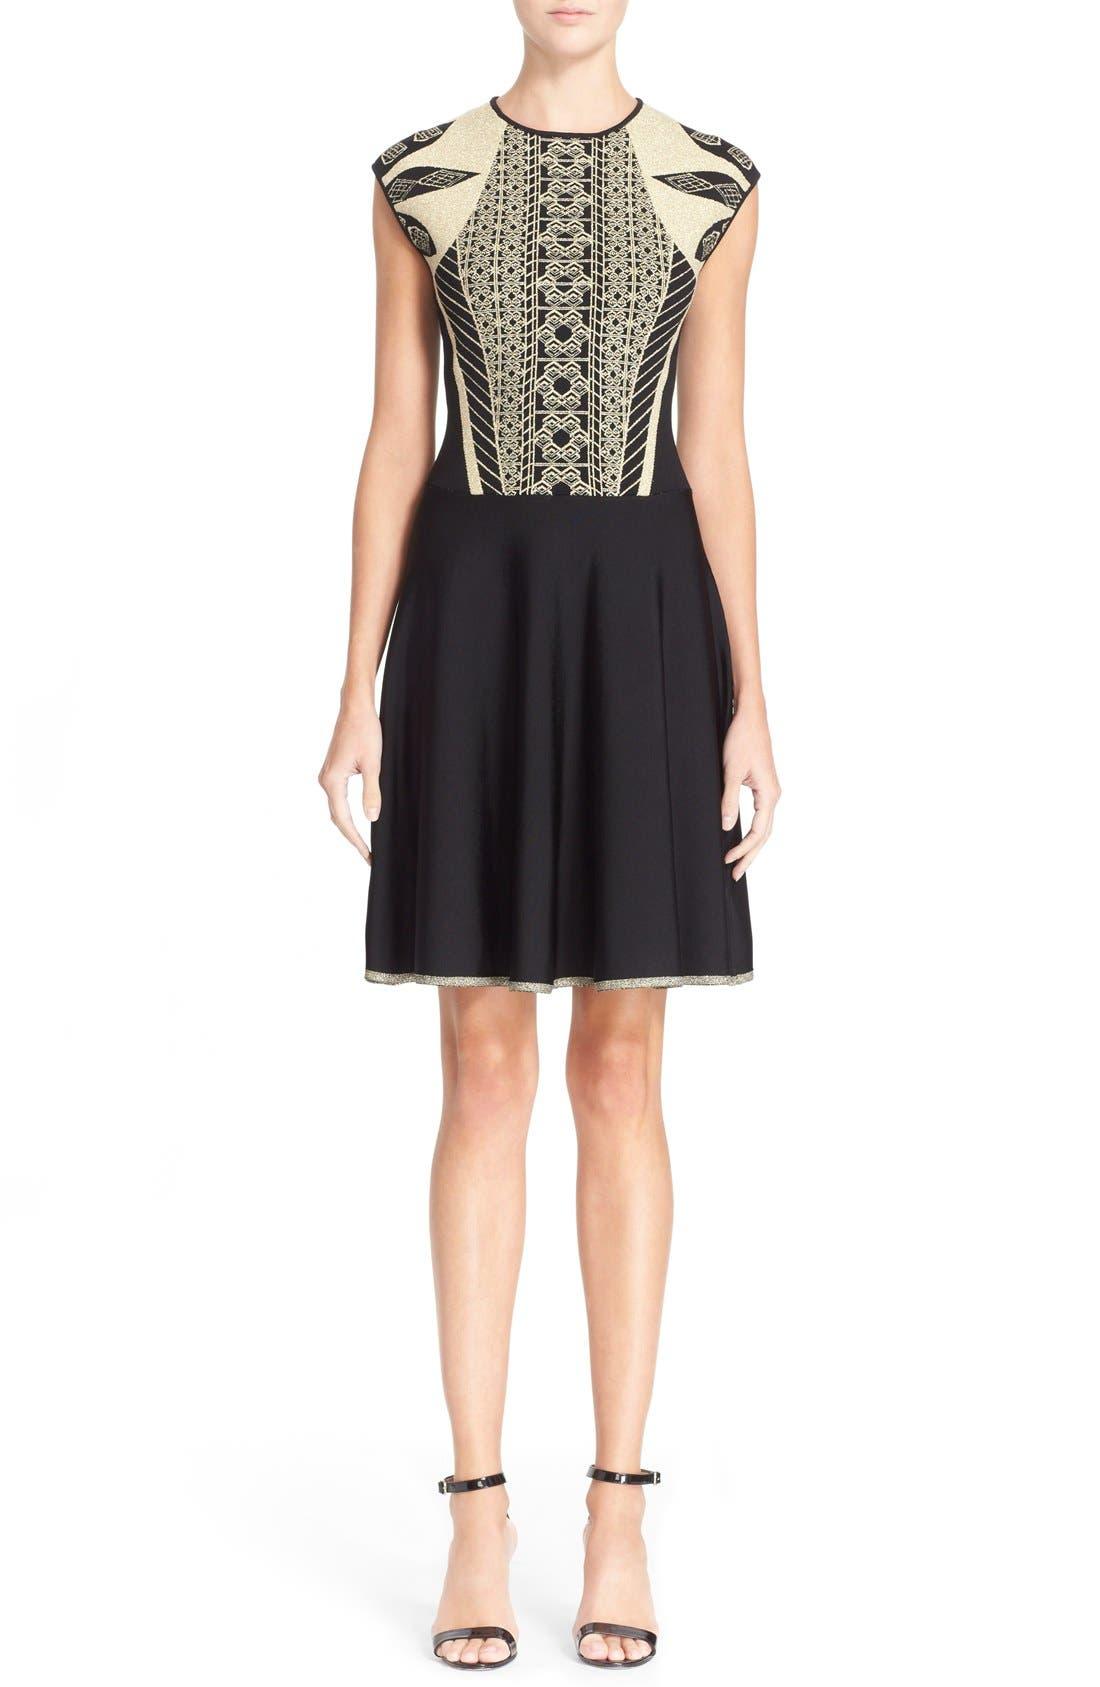 Main Image - Ted Baker London 'Jenkin' Metallic Jacquard Fit & Flare Dress